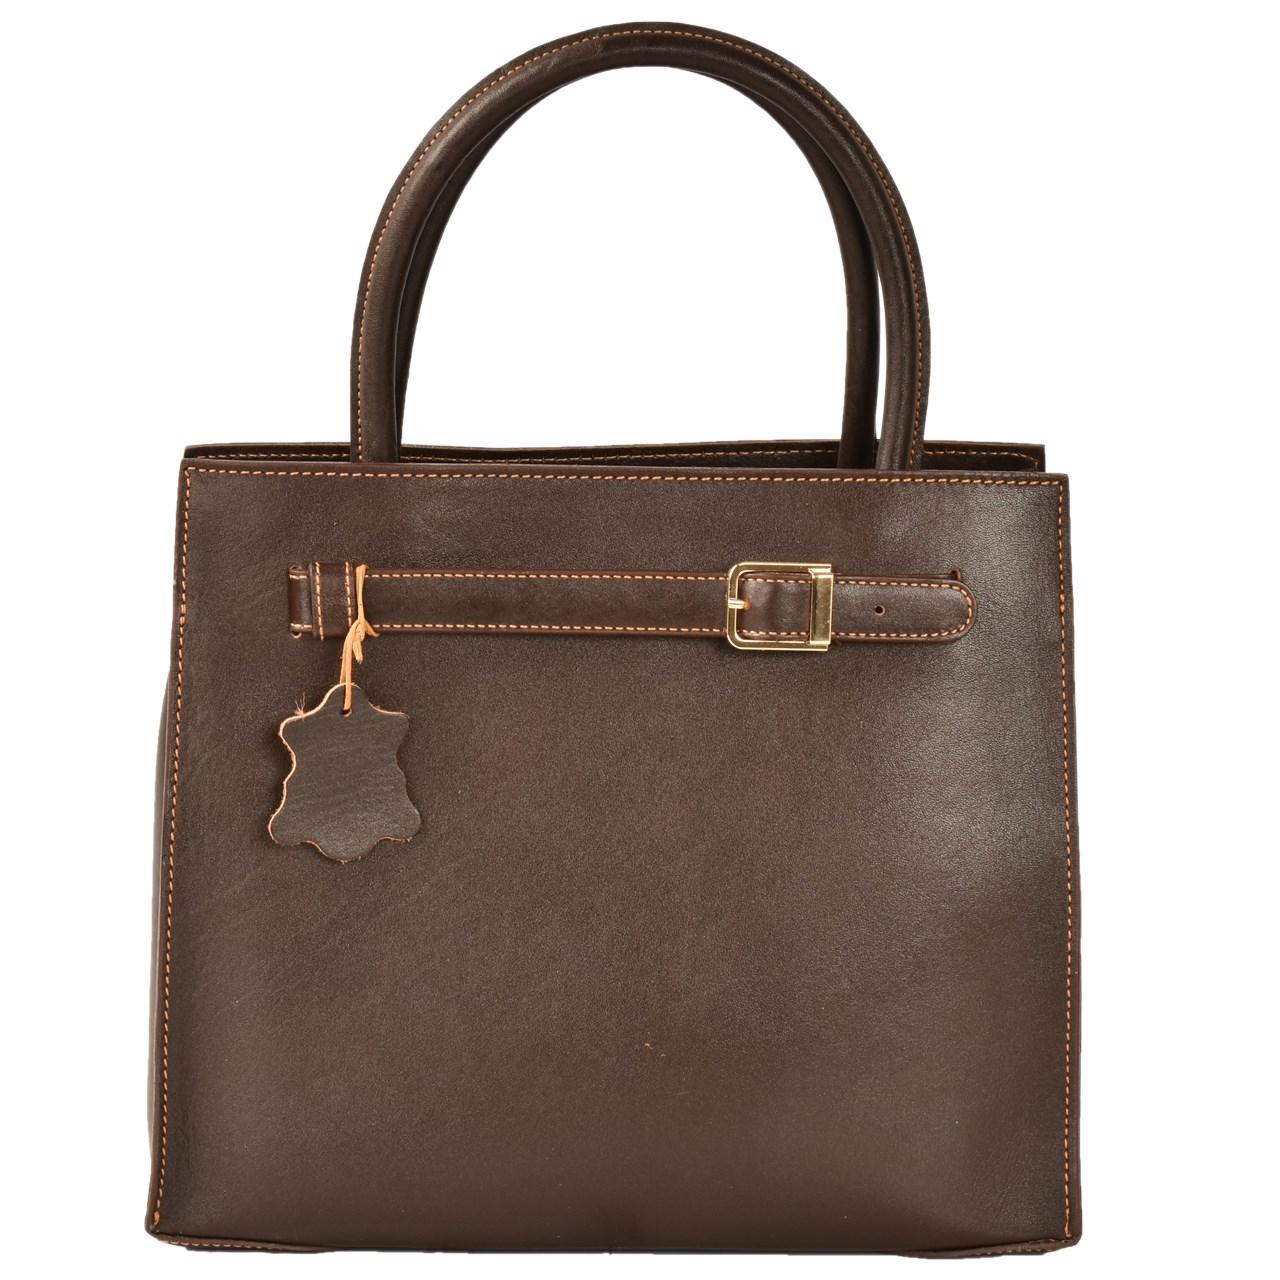 کیف دستی چرم طبیعی کهن چرم مدل V154-7